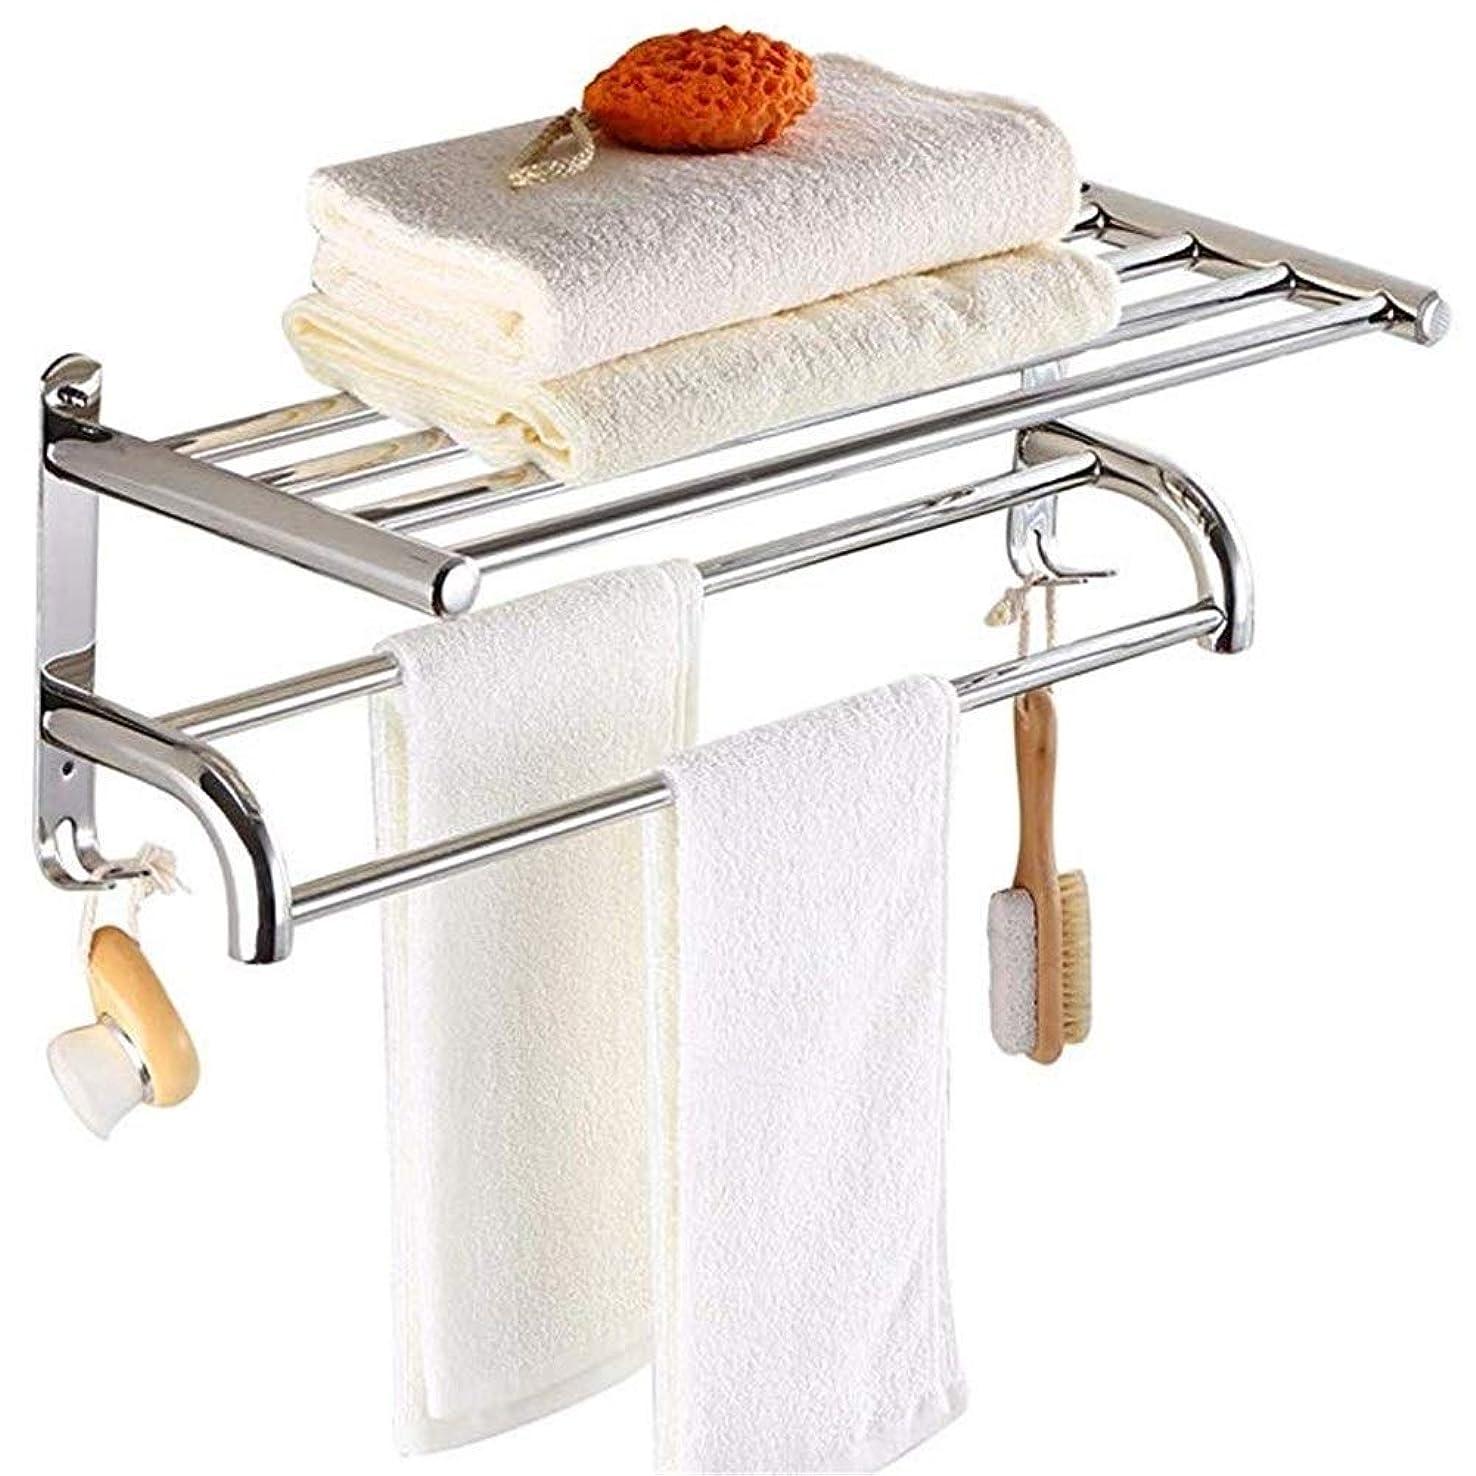 SHYPwM-タオルスタンド タオル掛けステンレススチールバスルームパンチフリータオル掛けウォールマウントタオルバーハードウェアペンダント (Size : 80cm)